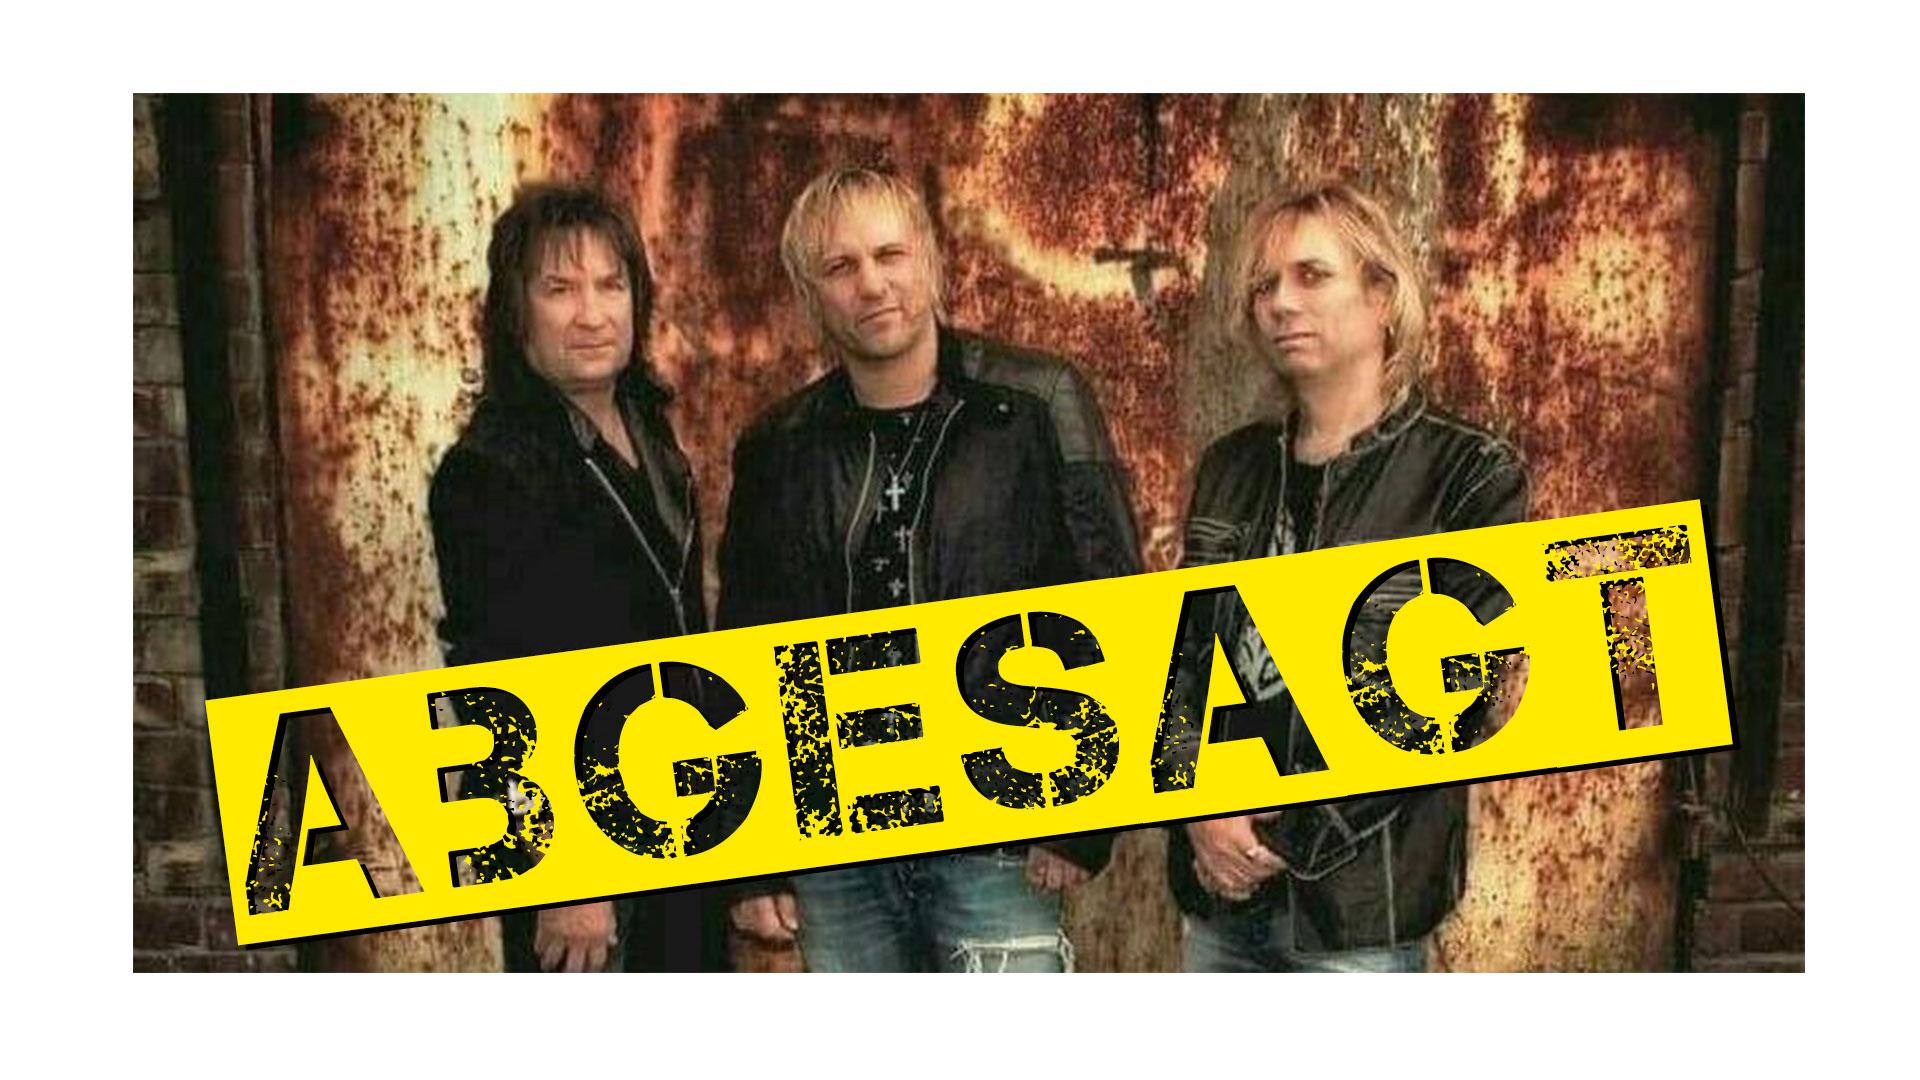 ABGESAGT: Spirit of Smokie - Live & Acoustic Tour 2020